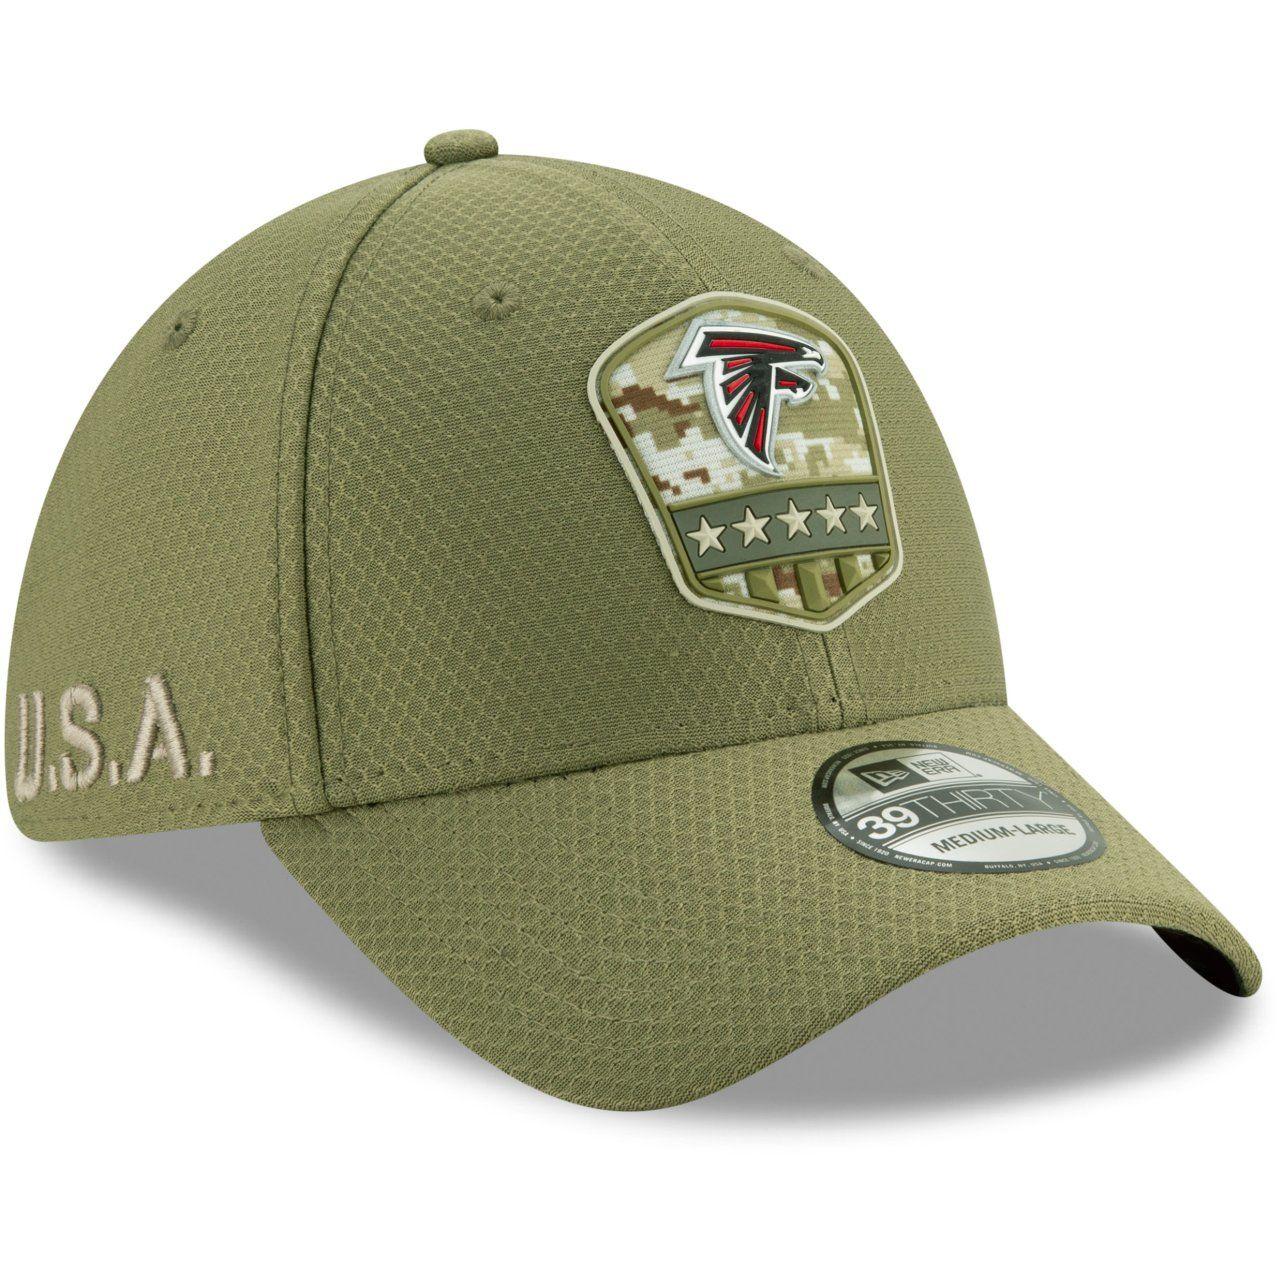 amfoo - New Era 39Thirty Cap Salute to Service Atlanta Falcons